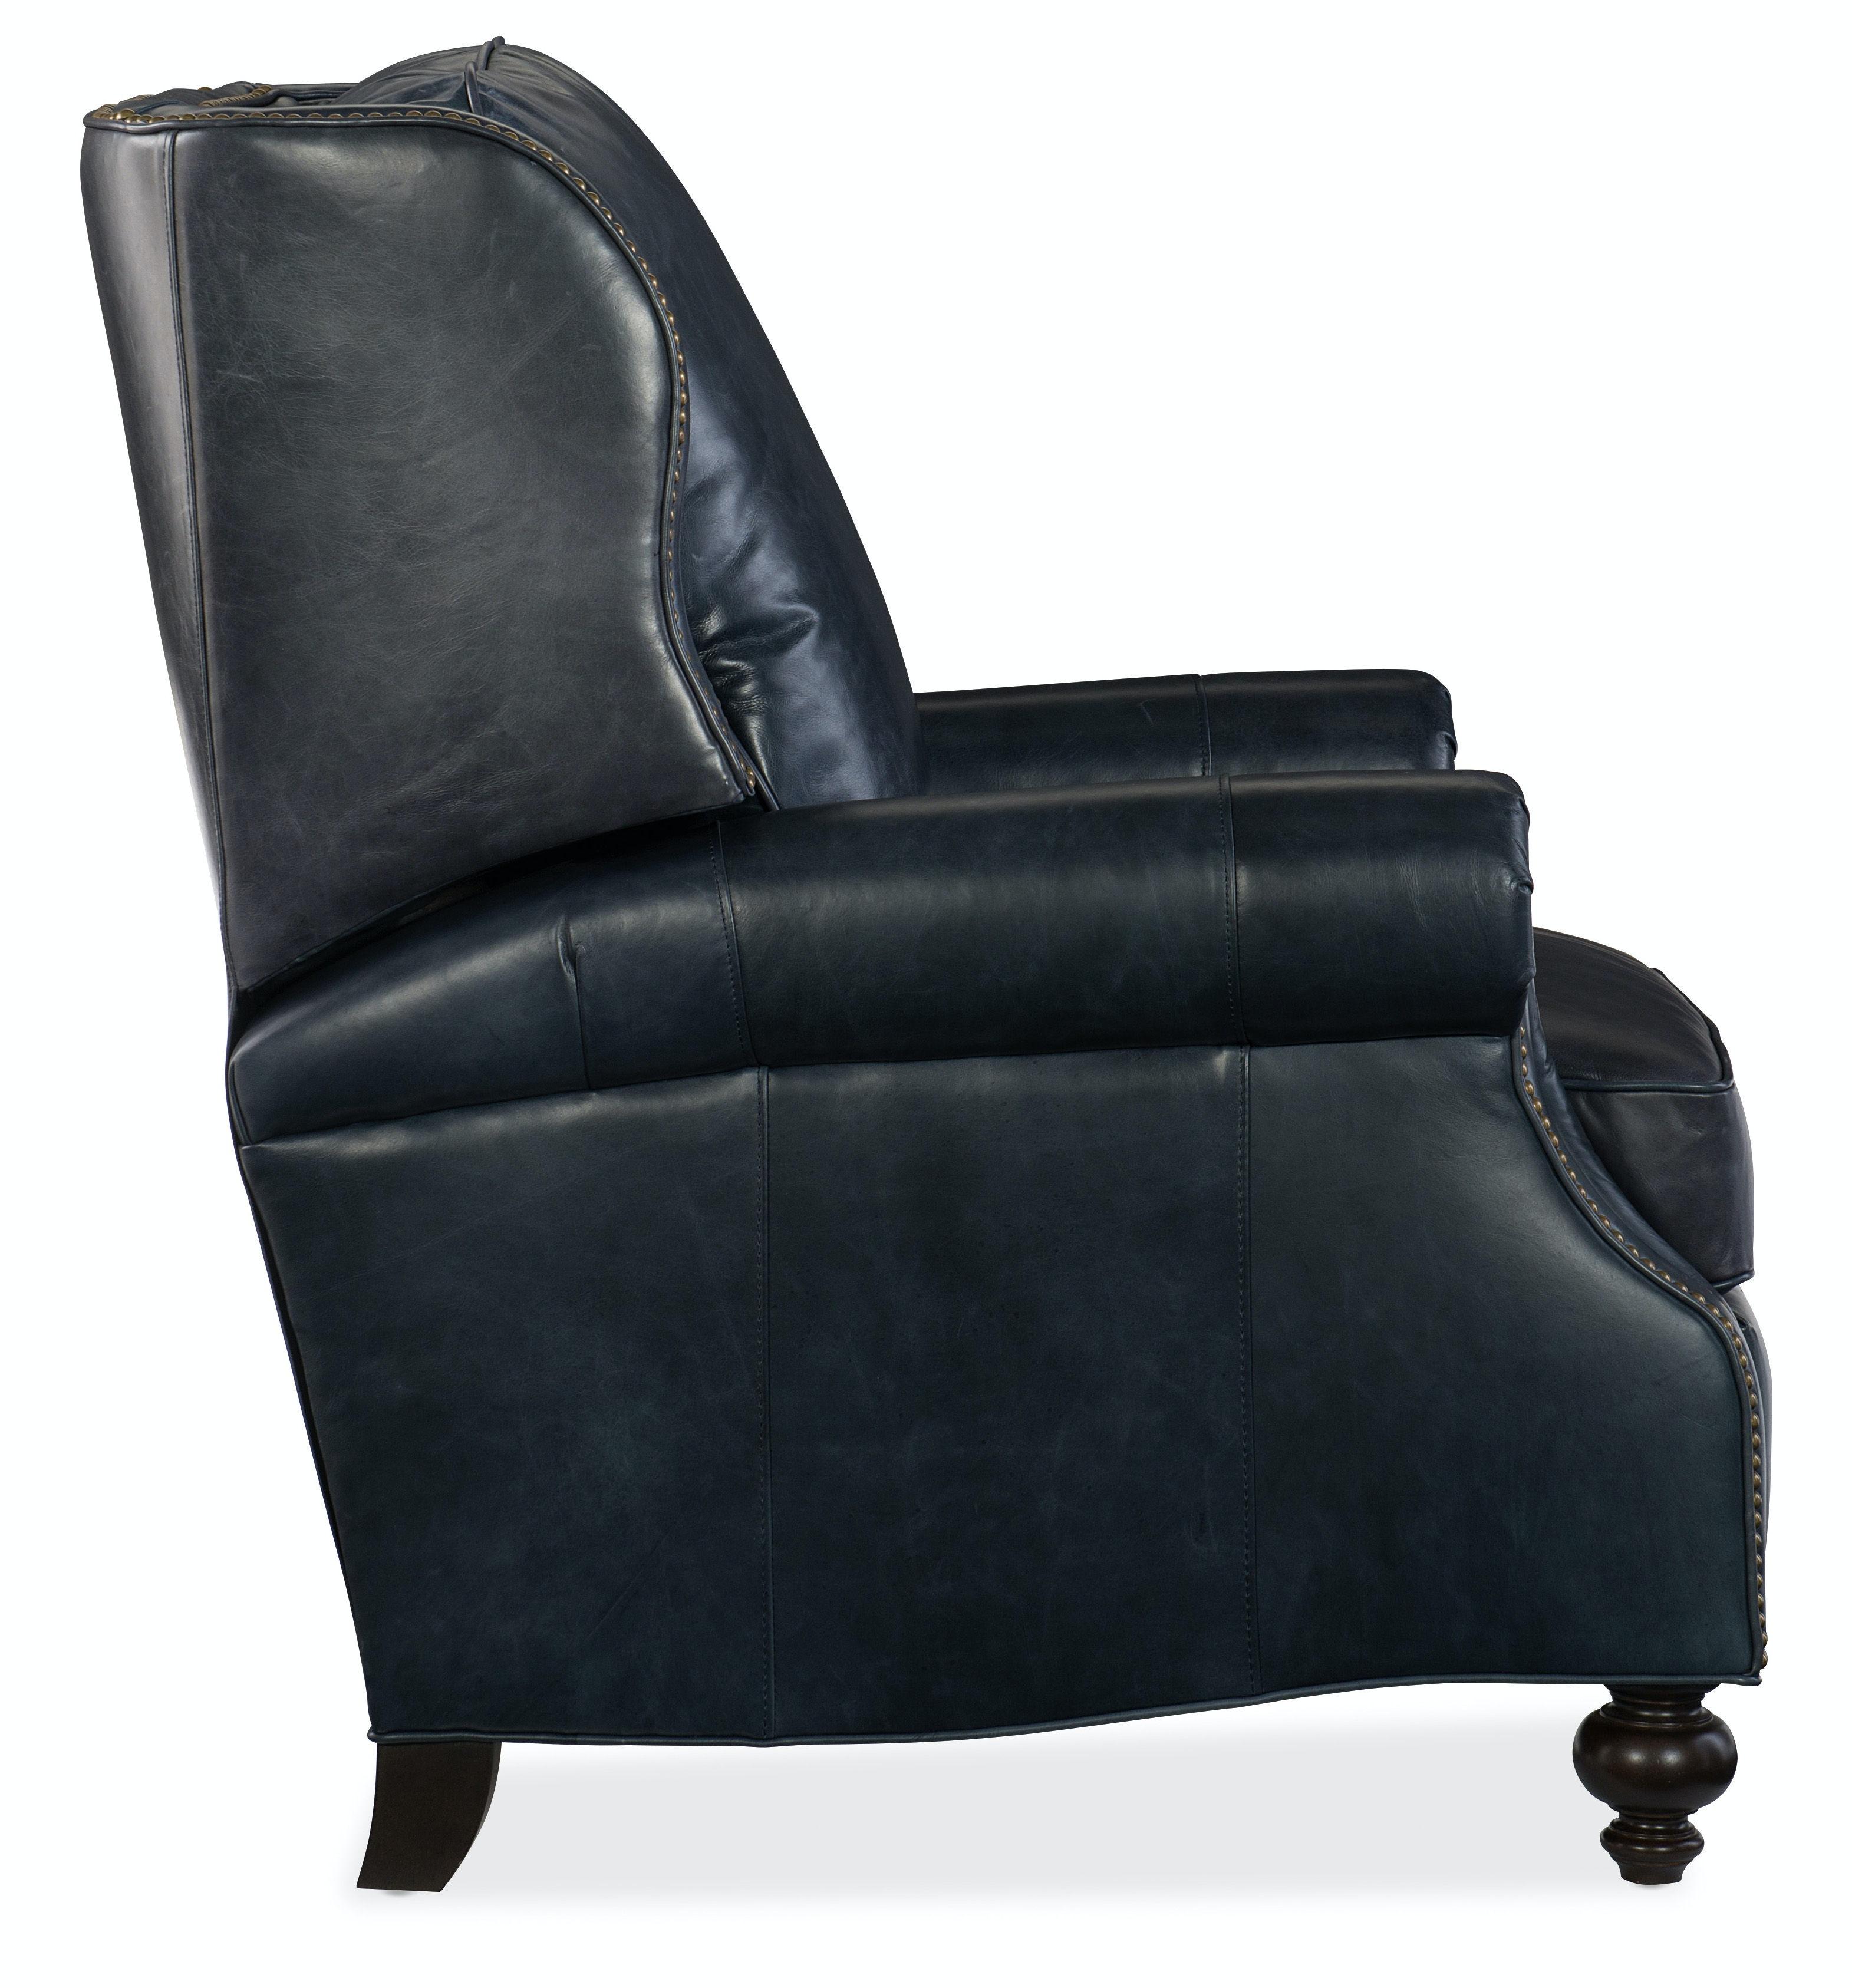 Hooker Furniture Drake Recliner RC140 048